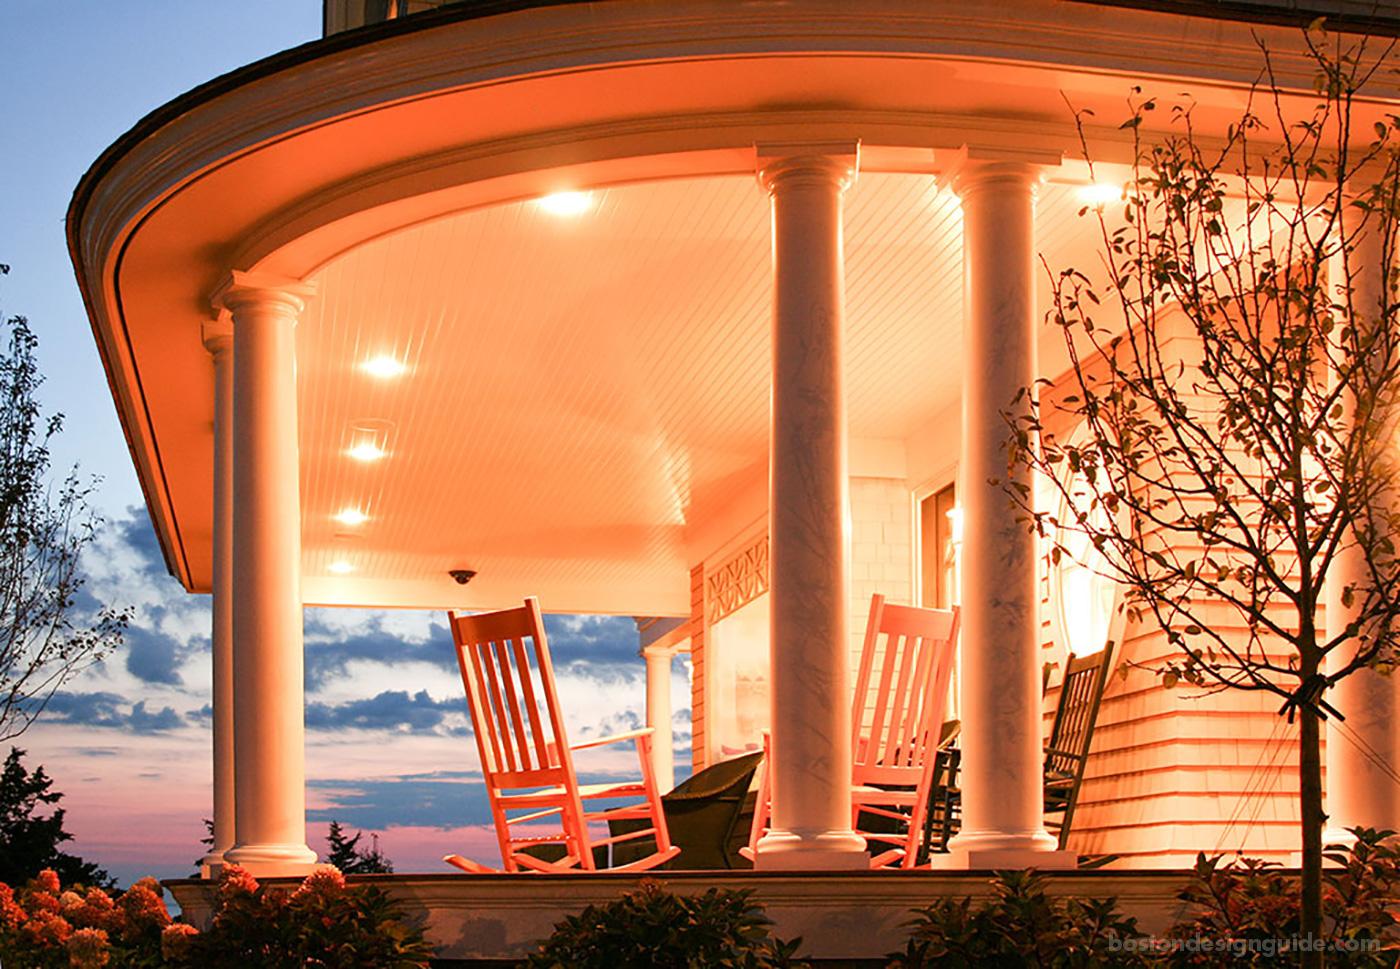 Cape cod veranda at sunset